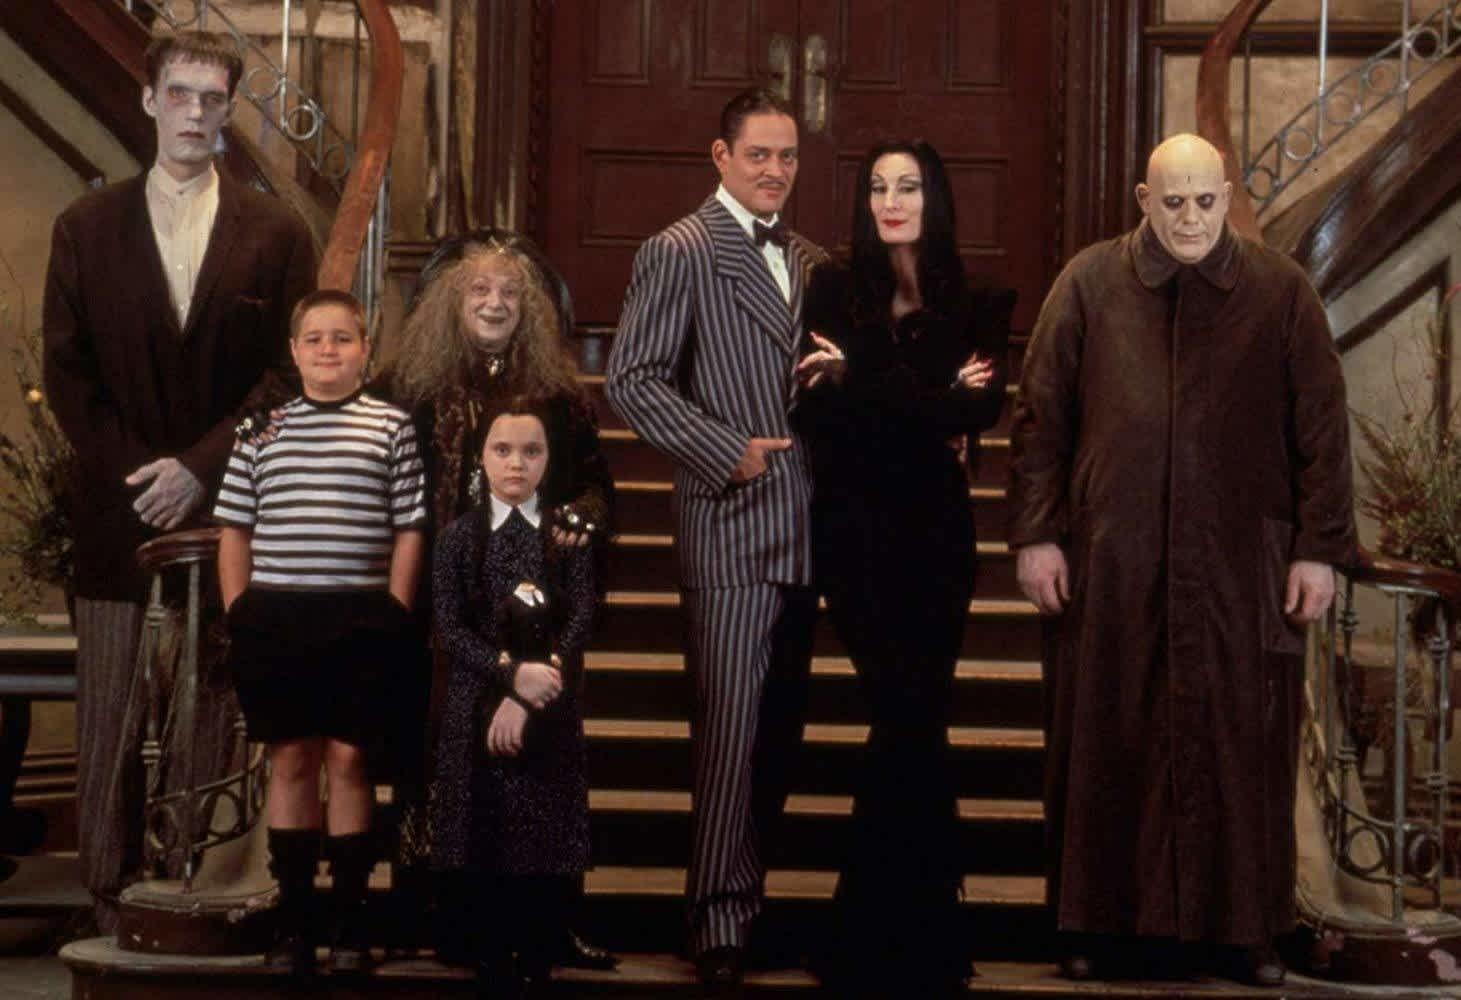 Freeform's '31 Nights of Halloween' Schedule Is Here & Promises Spooky Fun